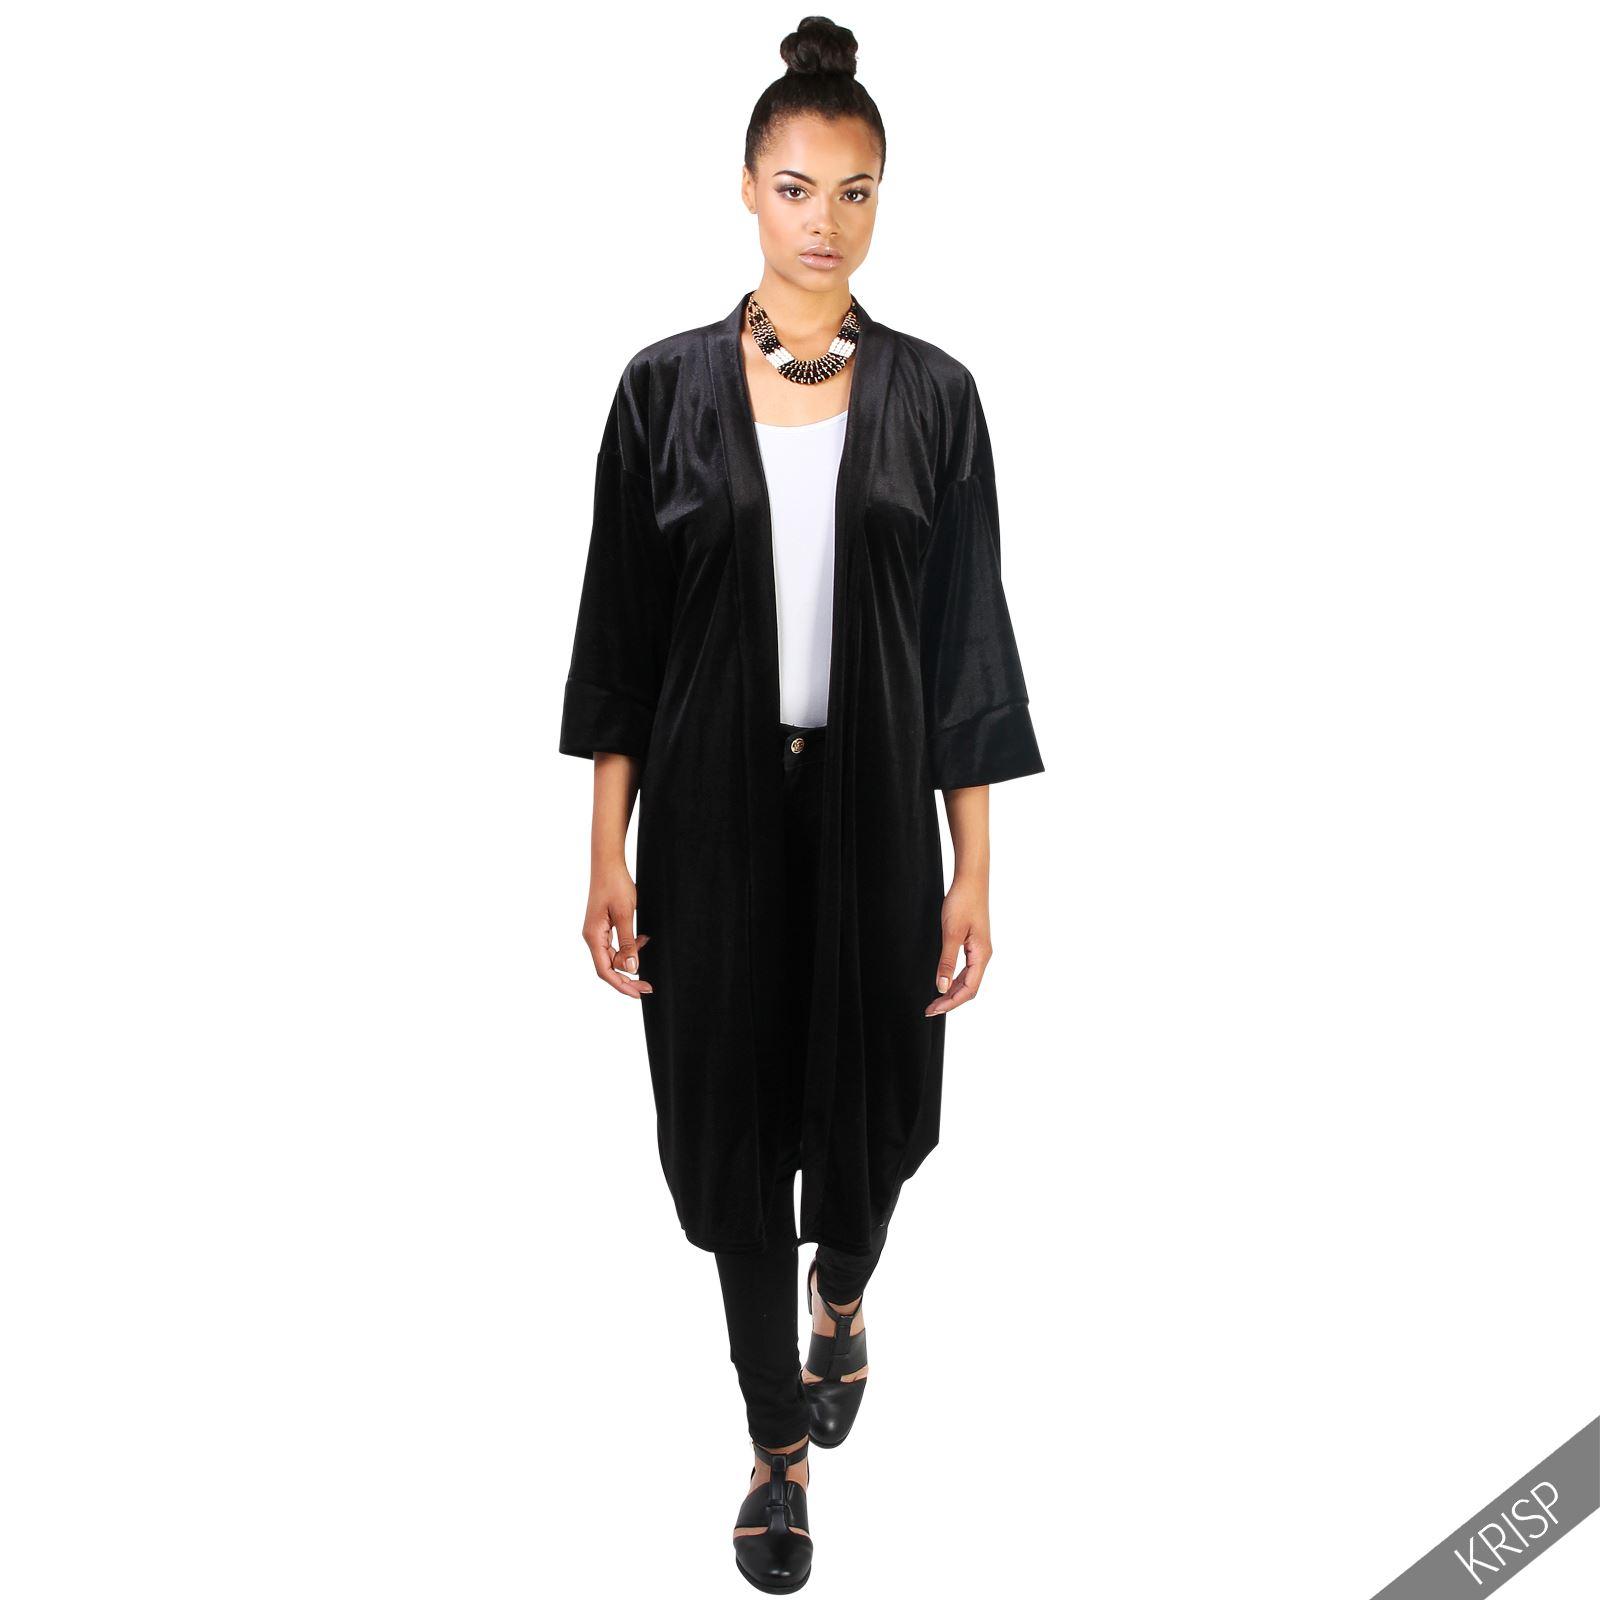 femmes kimono boho veste chic blazer ourlets mousseline de soie ample velours ebay. Black Bedroom Furniture Sets. Home Design Ideas